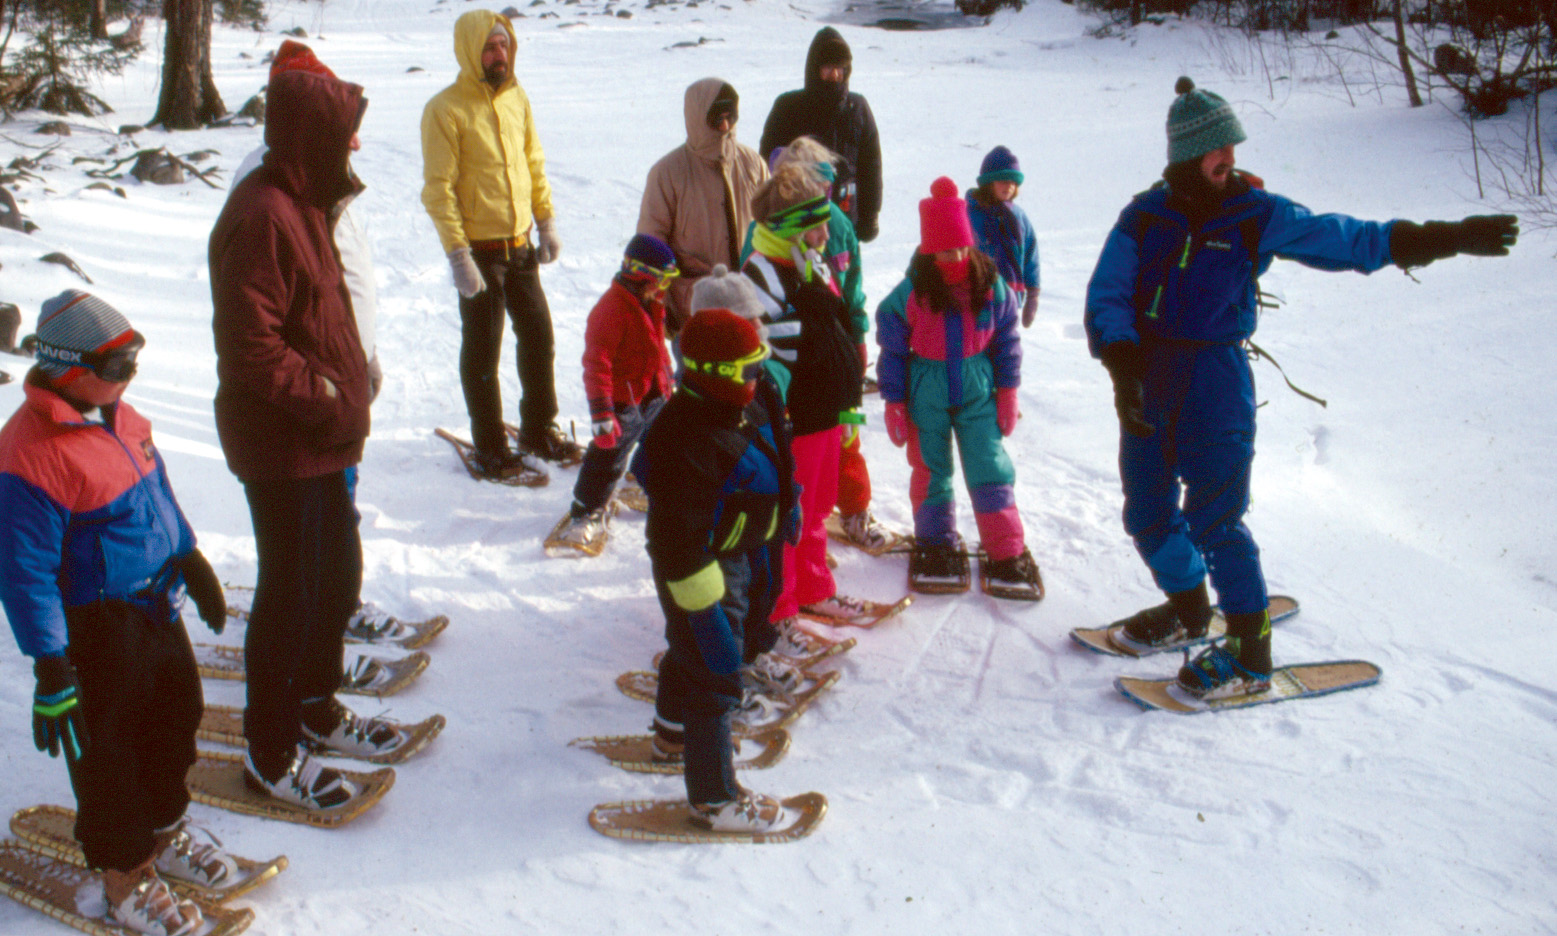 Jerry Shereda keeping kids active in winter snowshoeing pragmatic mom